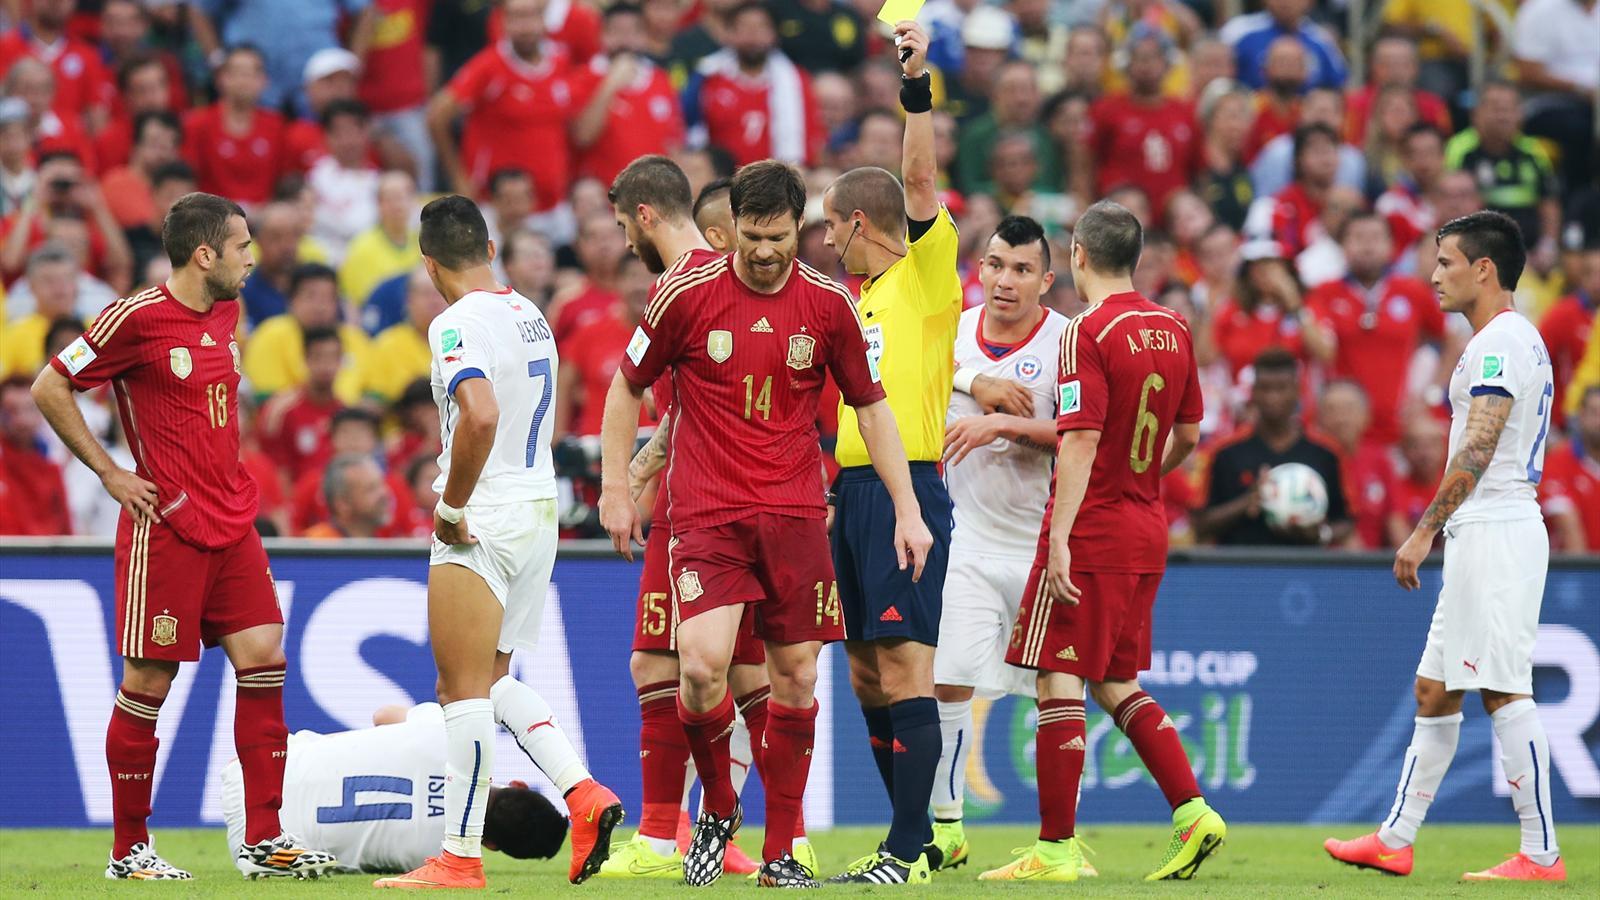 Xabi Alonso averti par l'arbitre lors d'Espagne - Chili - Mondial 2014